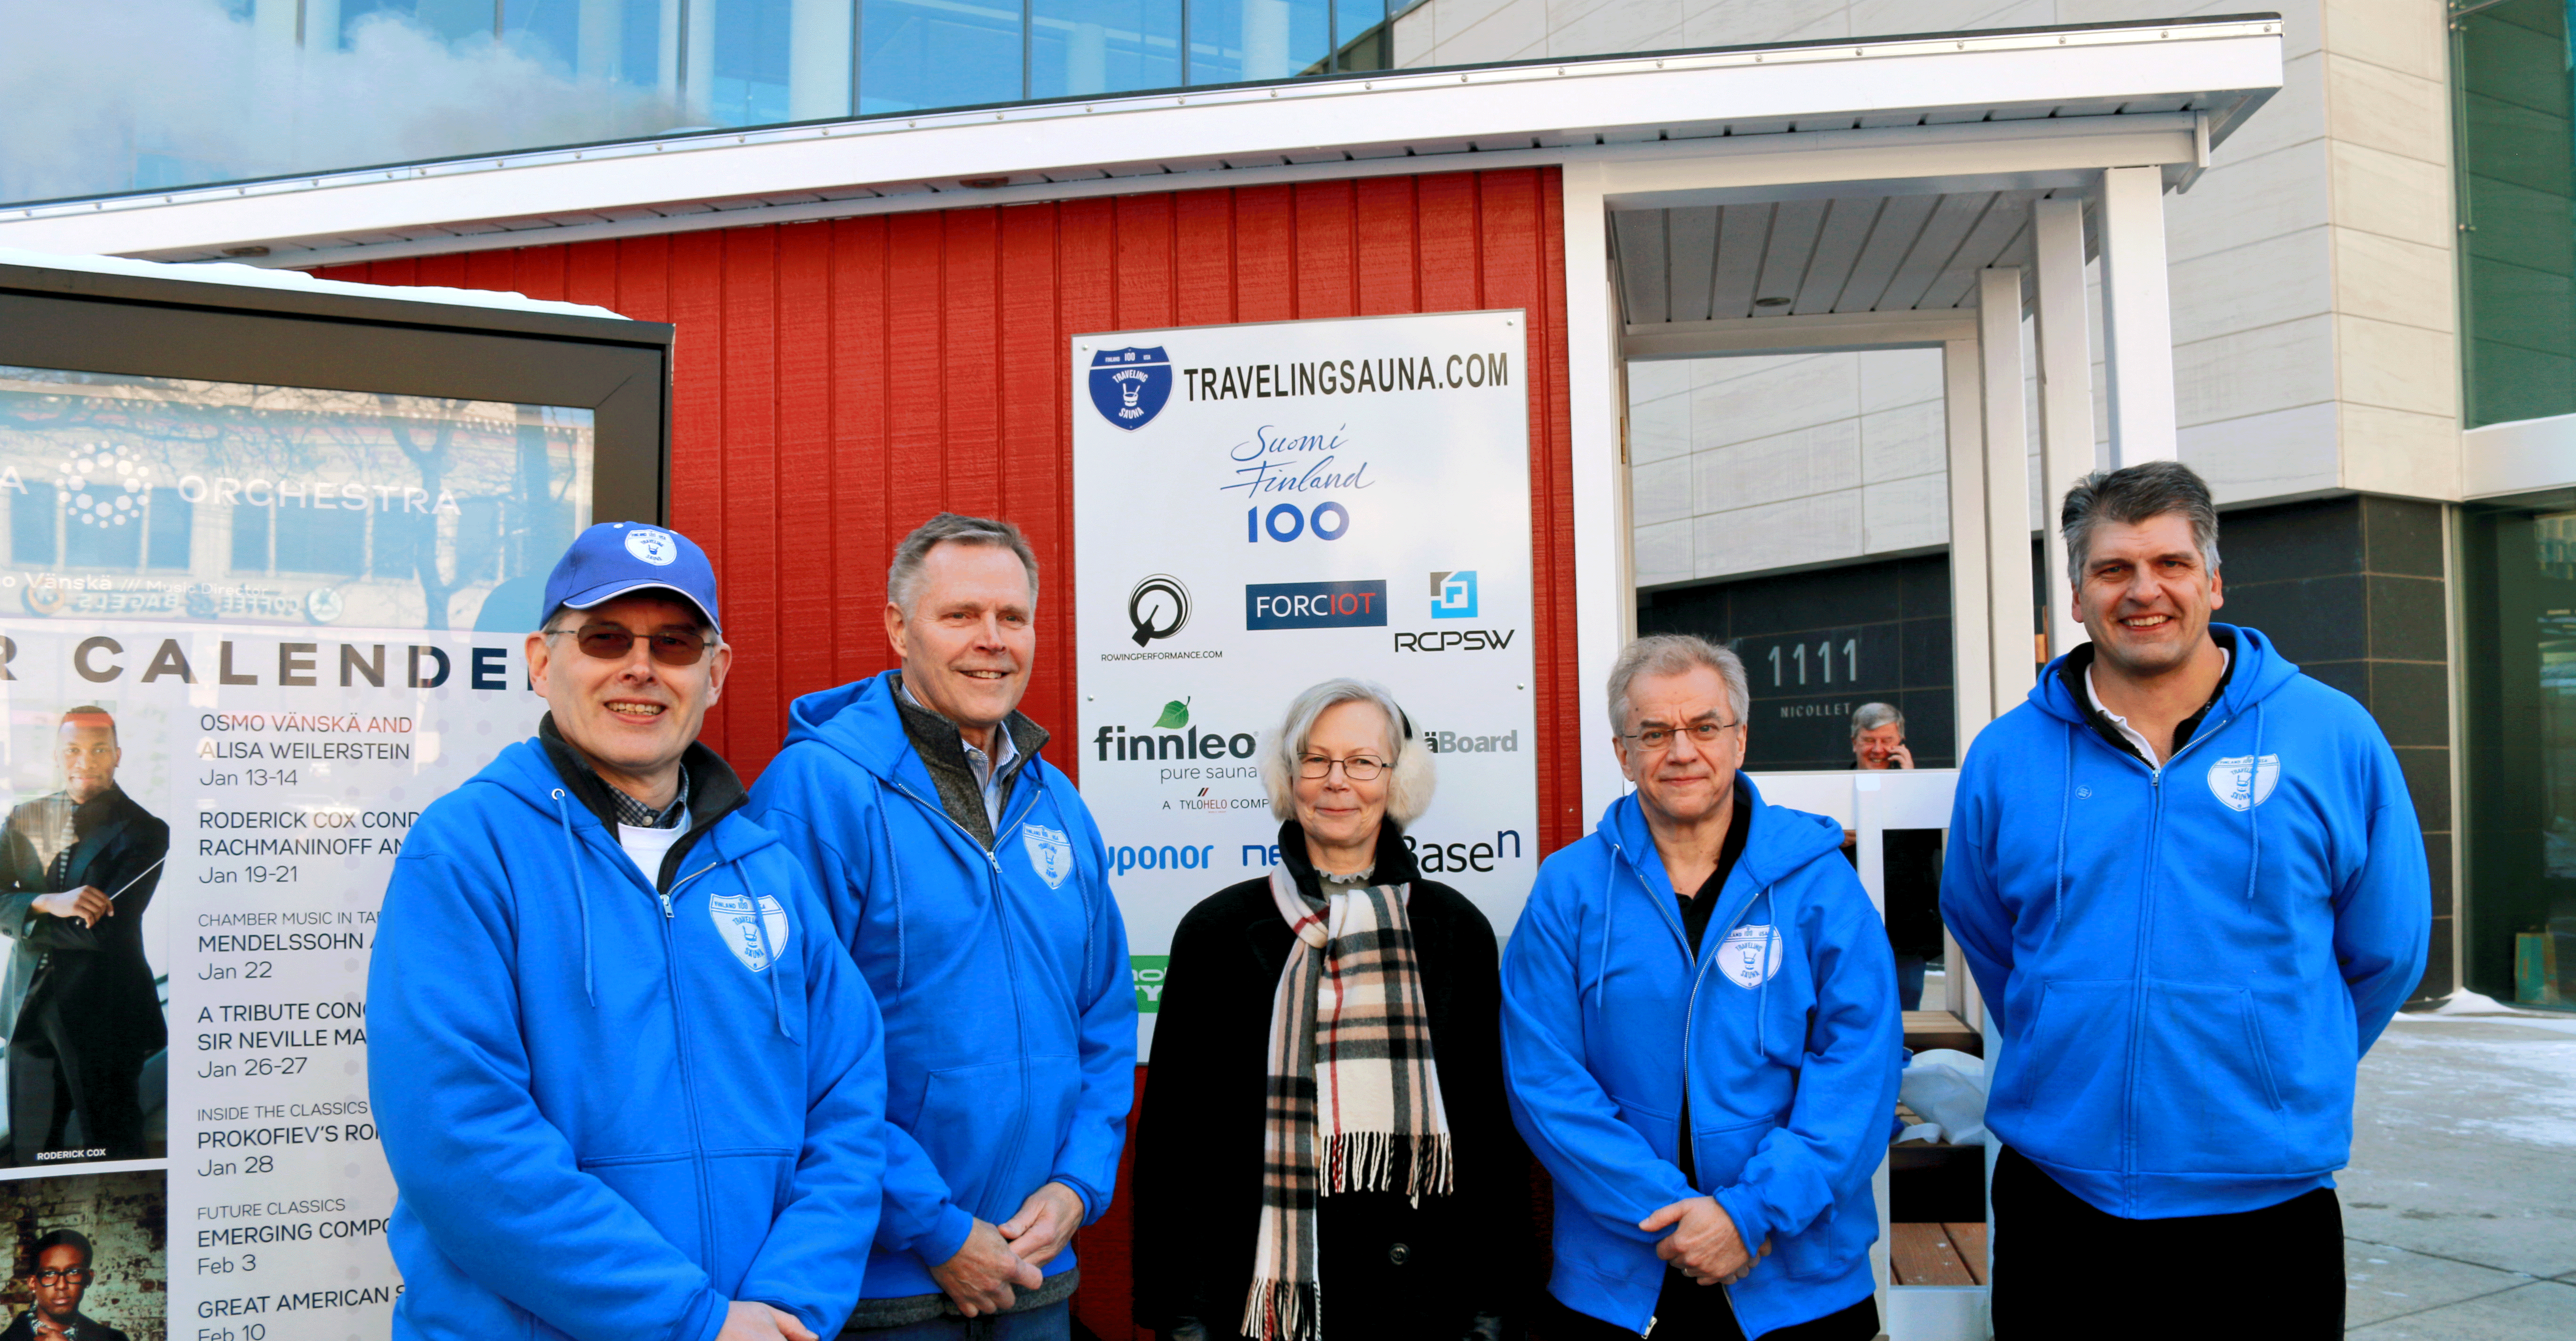 Traveling-Sauna-with-Ambassador-Kauppi,-Osmo-Vanska-and-Finnleo---web.png